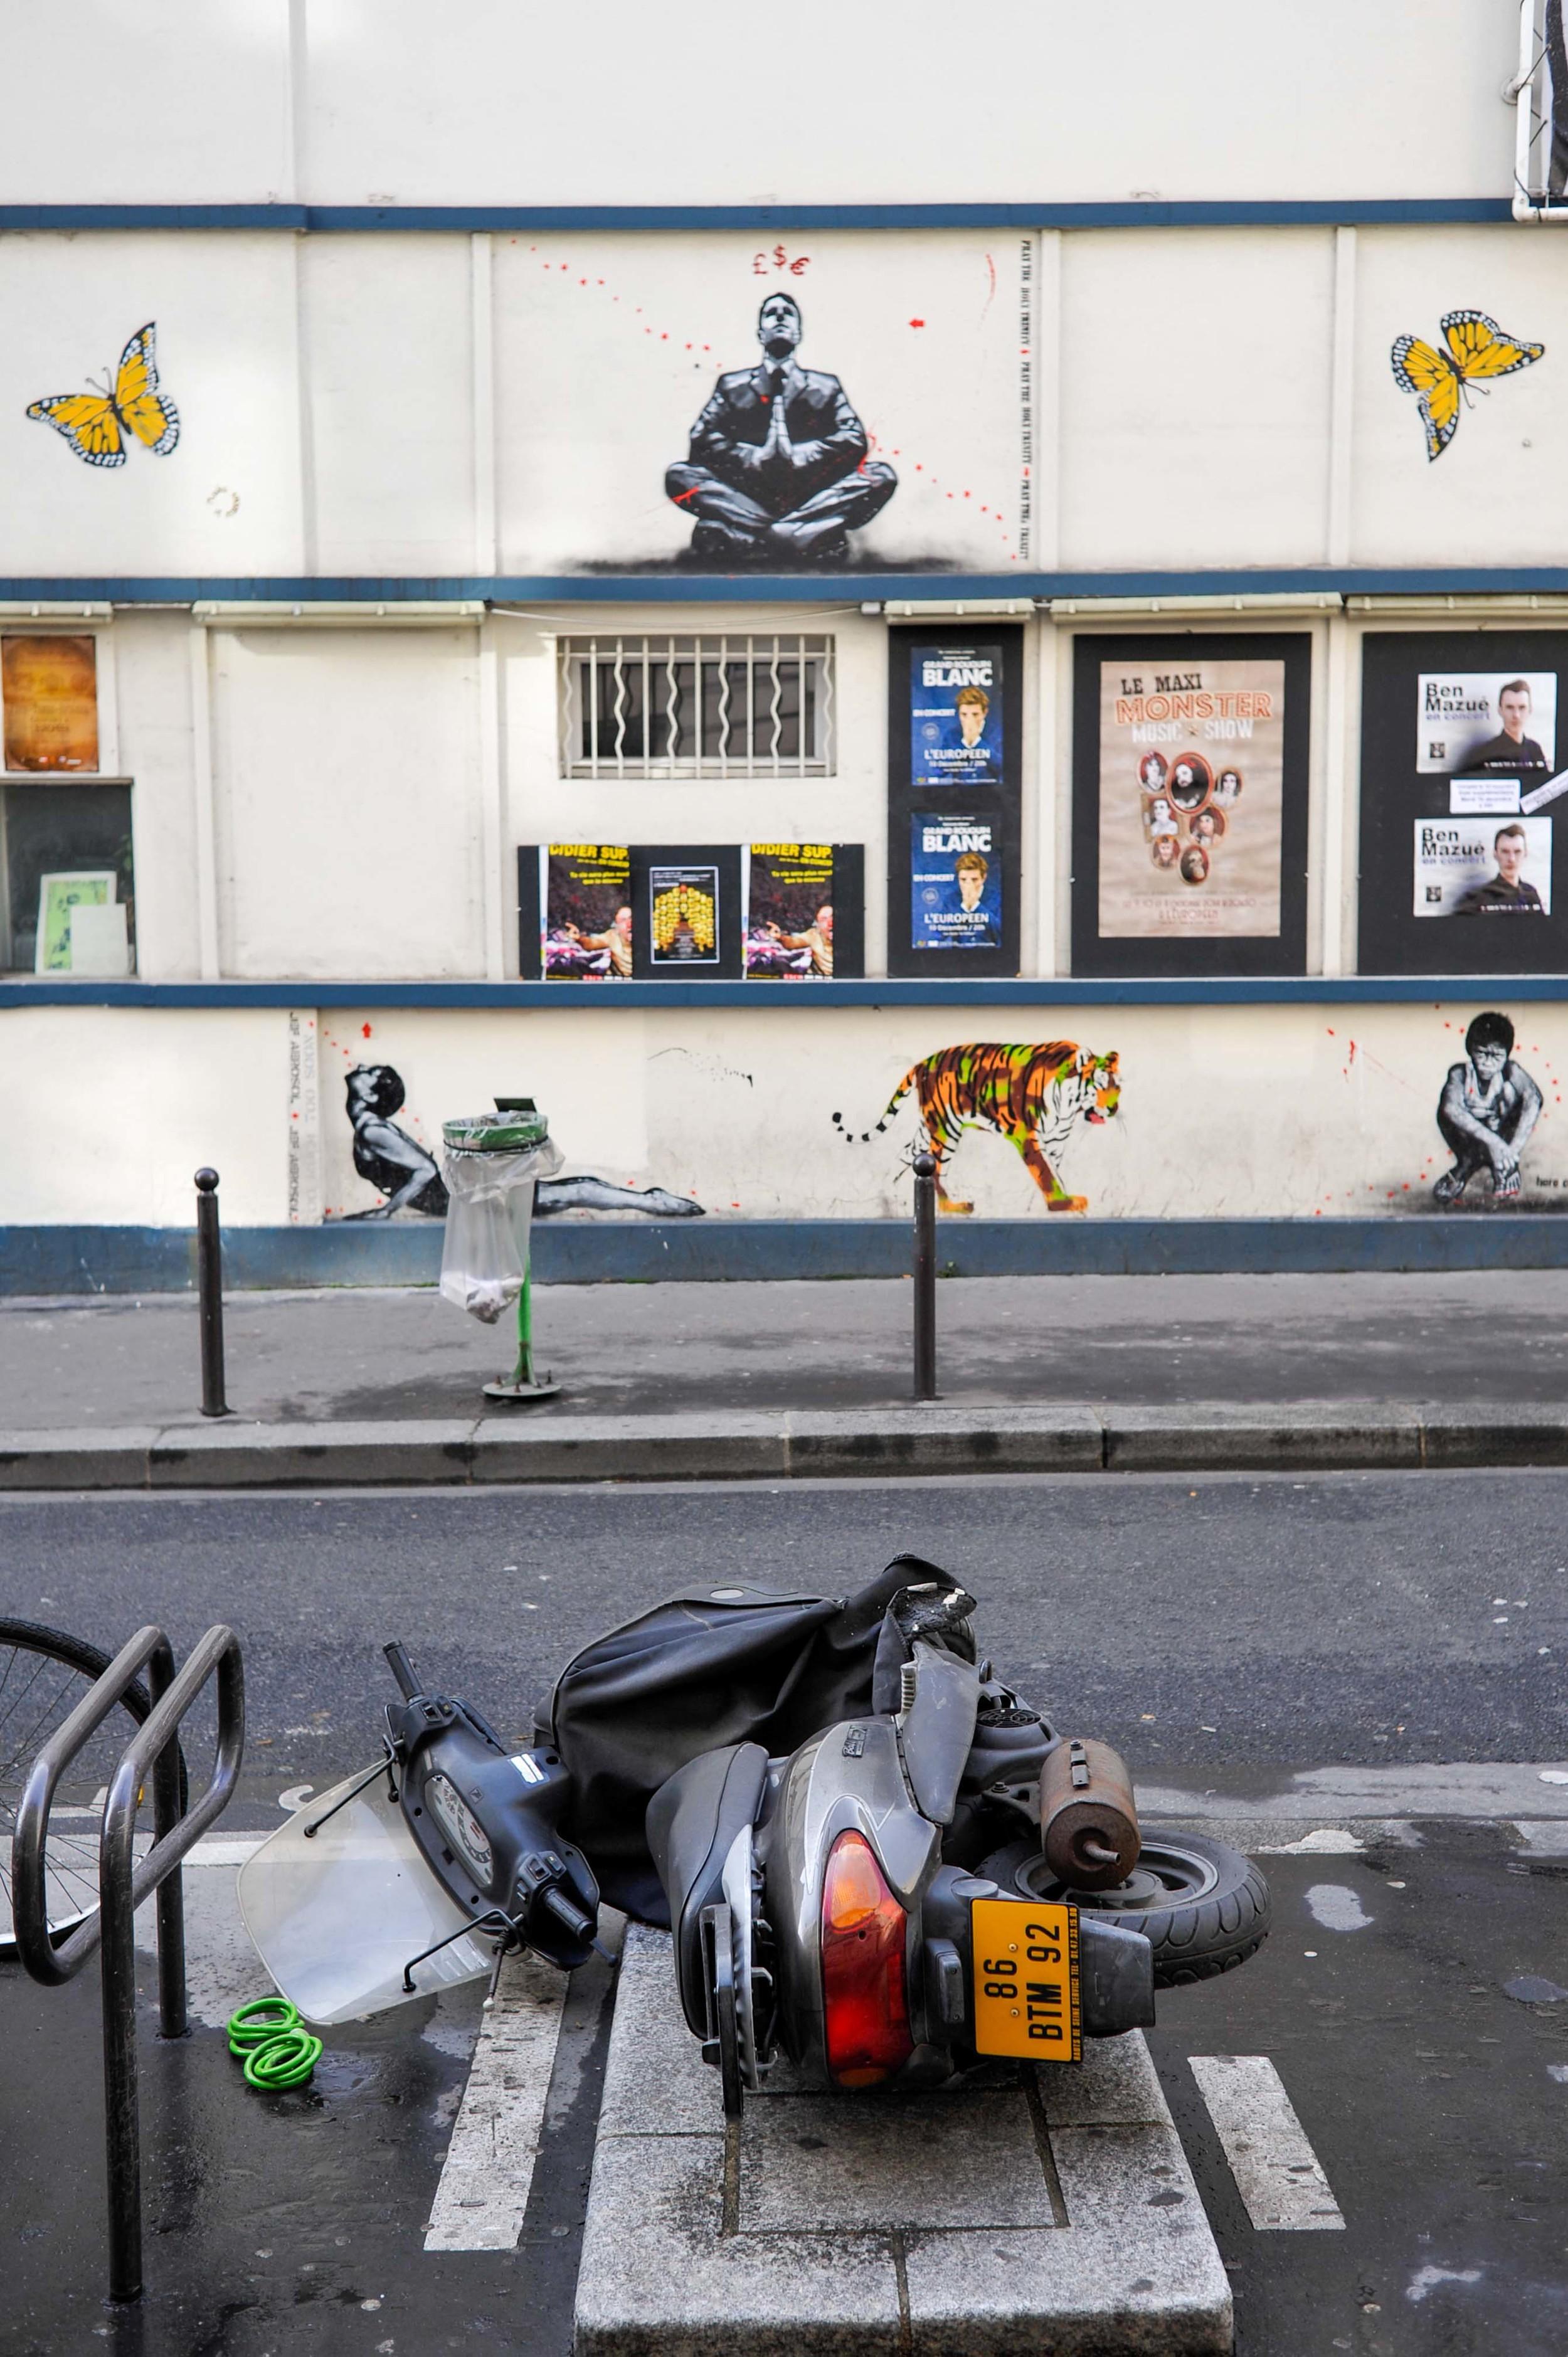 Paris_web_2014-1.jpg